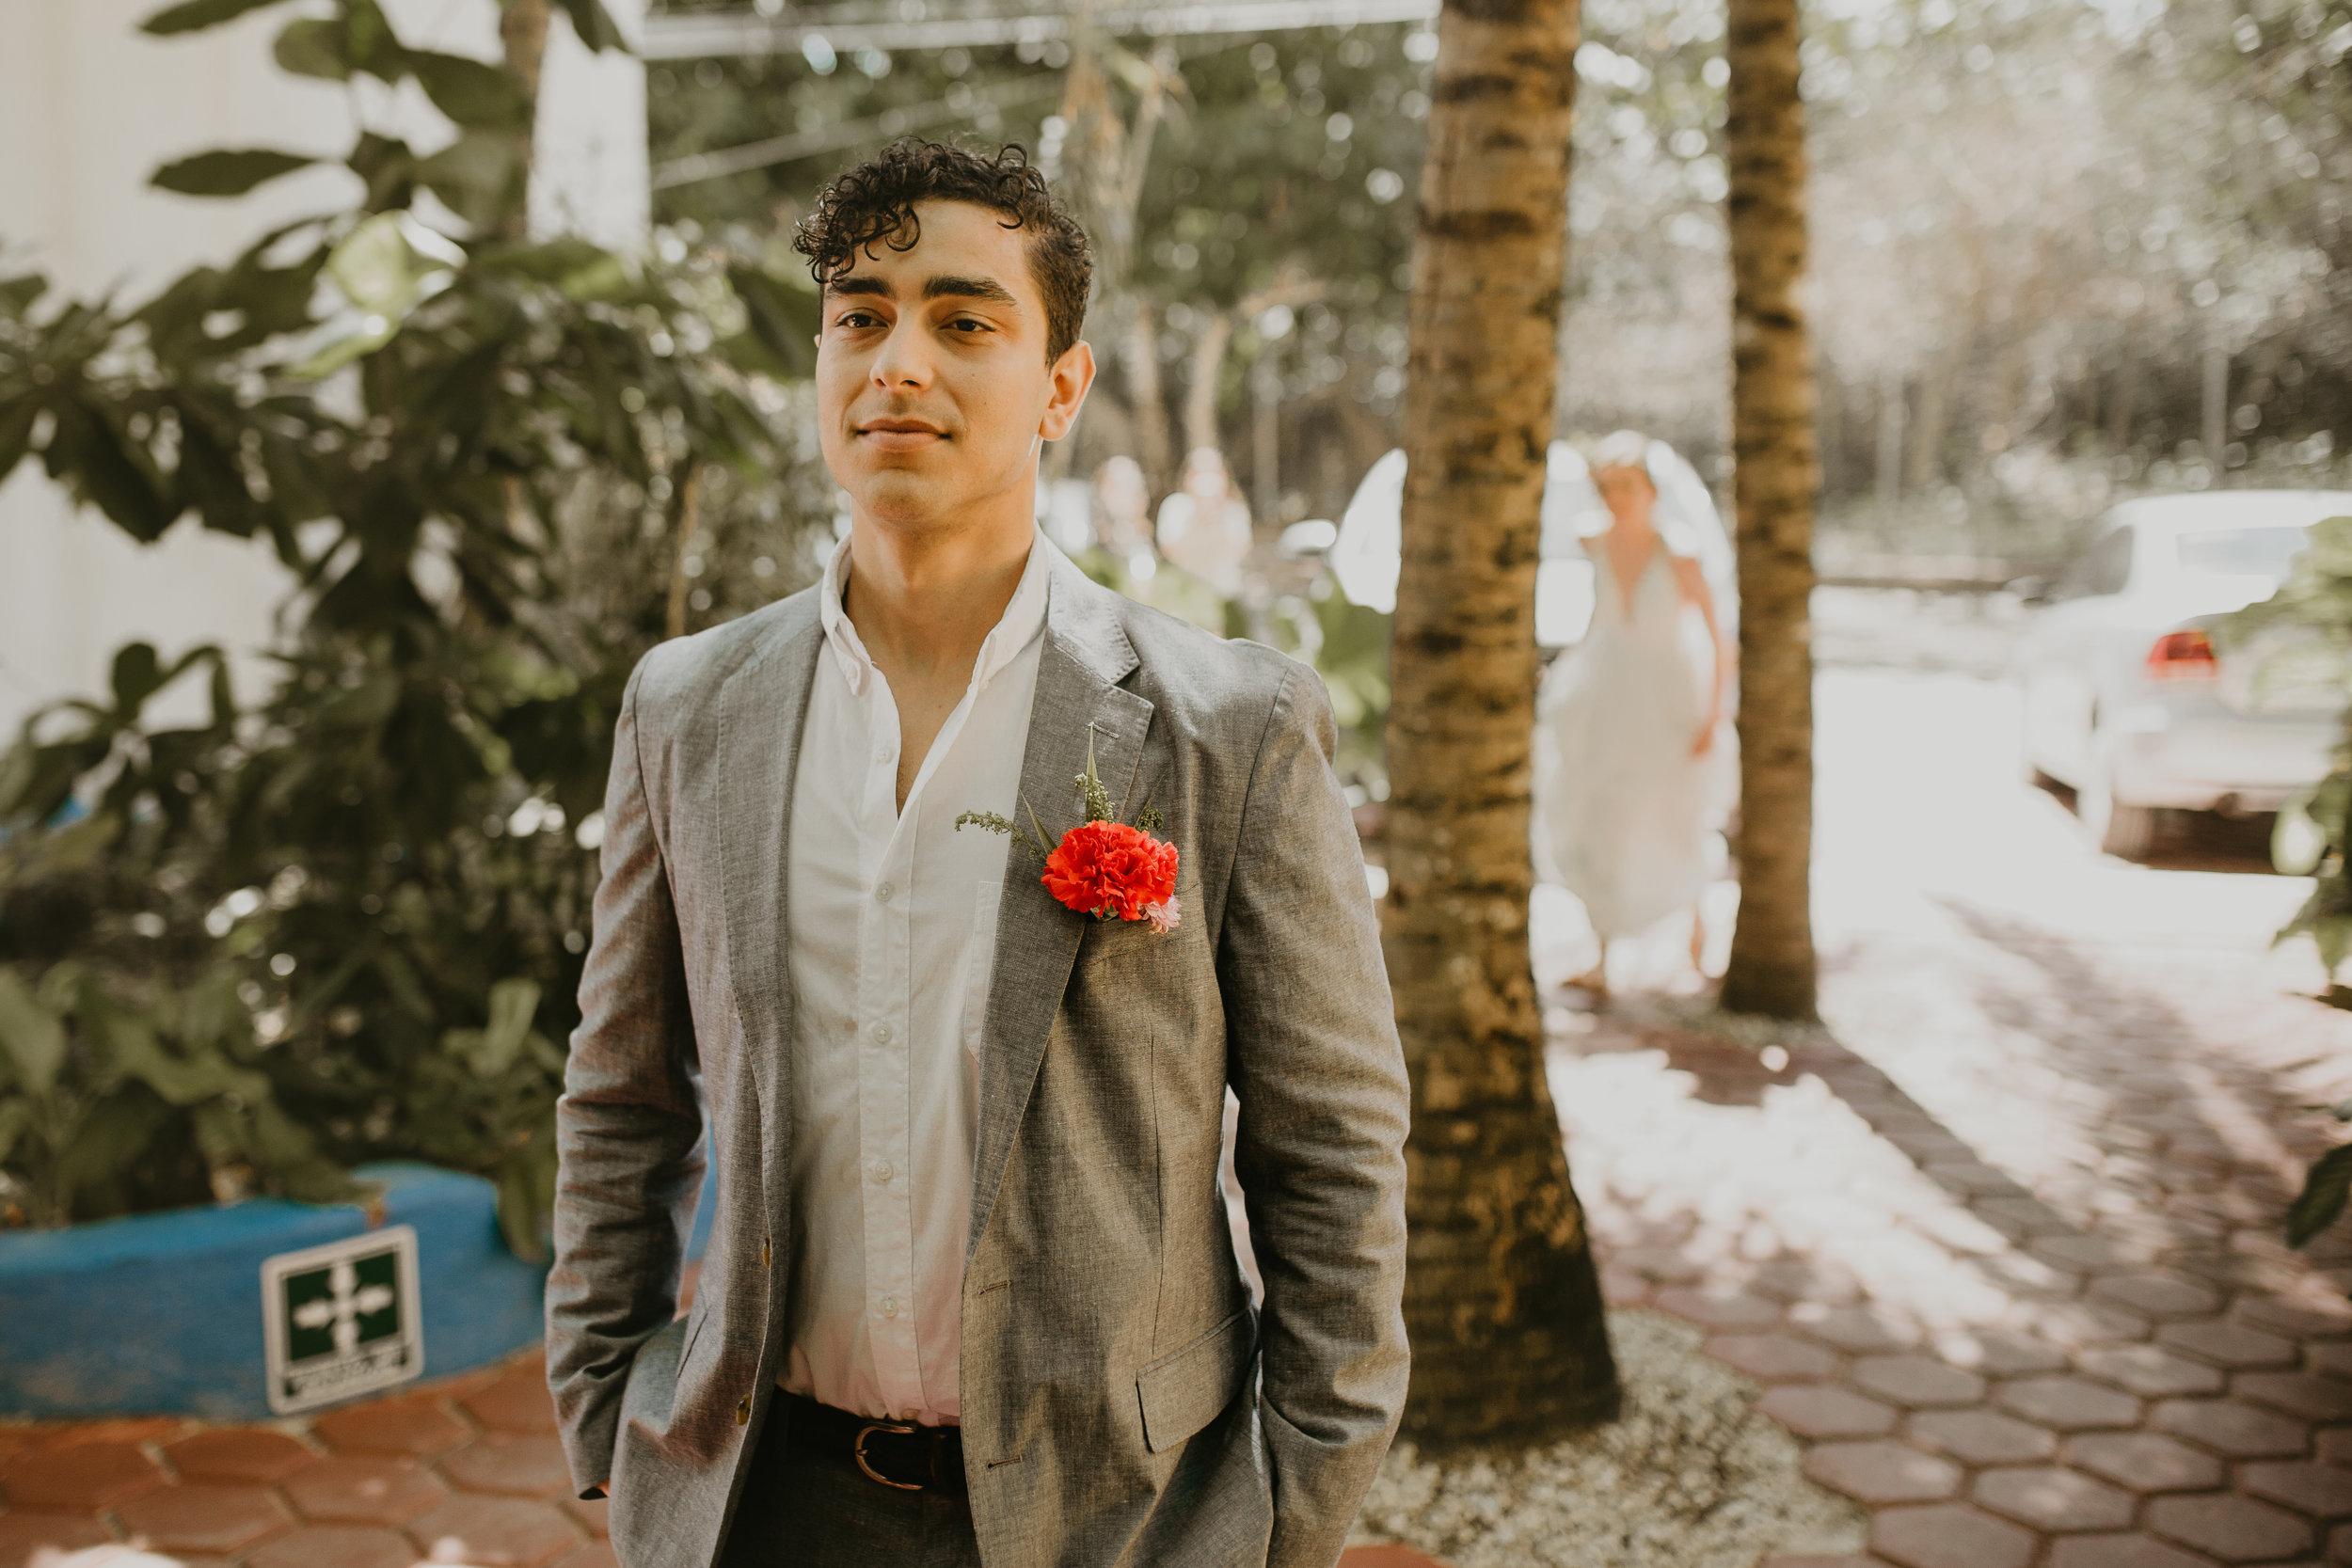 Nicole-Daacke-Photography-beachfront-akumal-destionation-wedding-tulum-mexico-elopement-photographer-destination-wedding-inspiration-sunset-champagne-pop-boho-bride-ocean-tropical-bohemian-tulum-wedding-photos-102.jpg